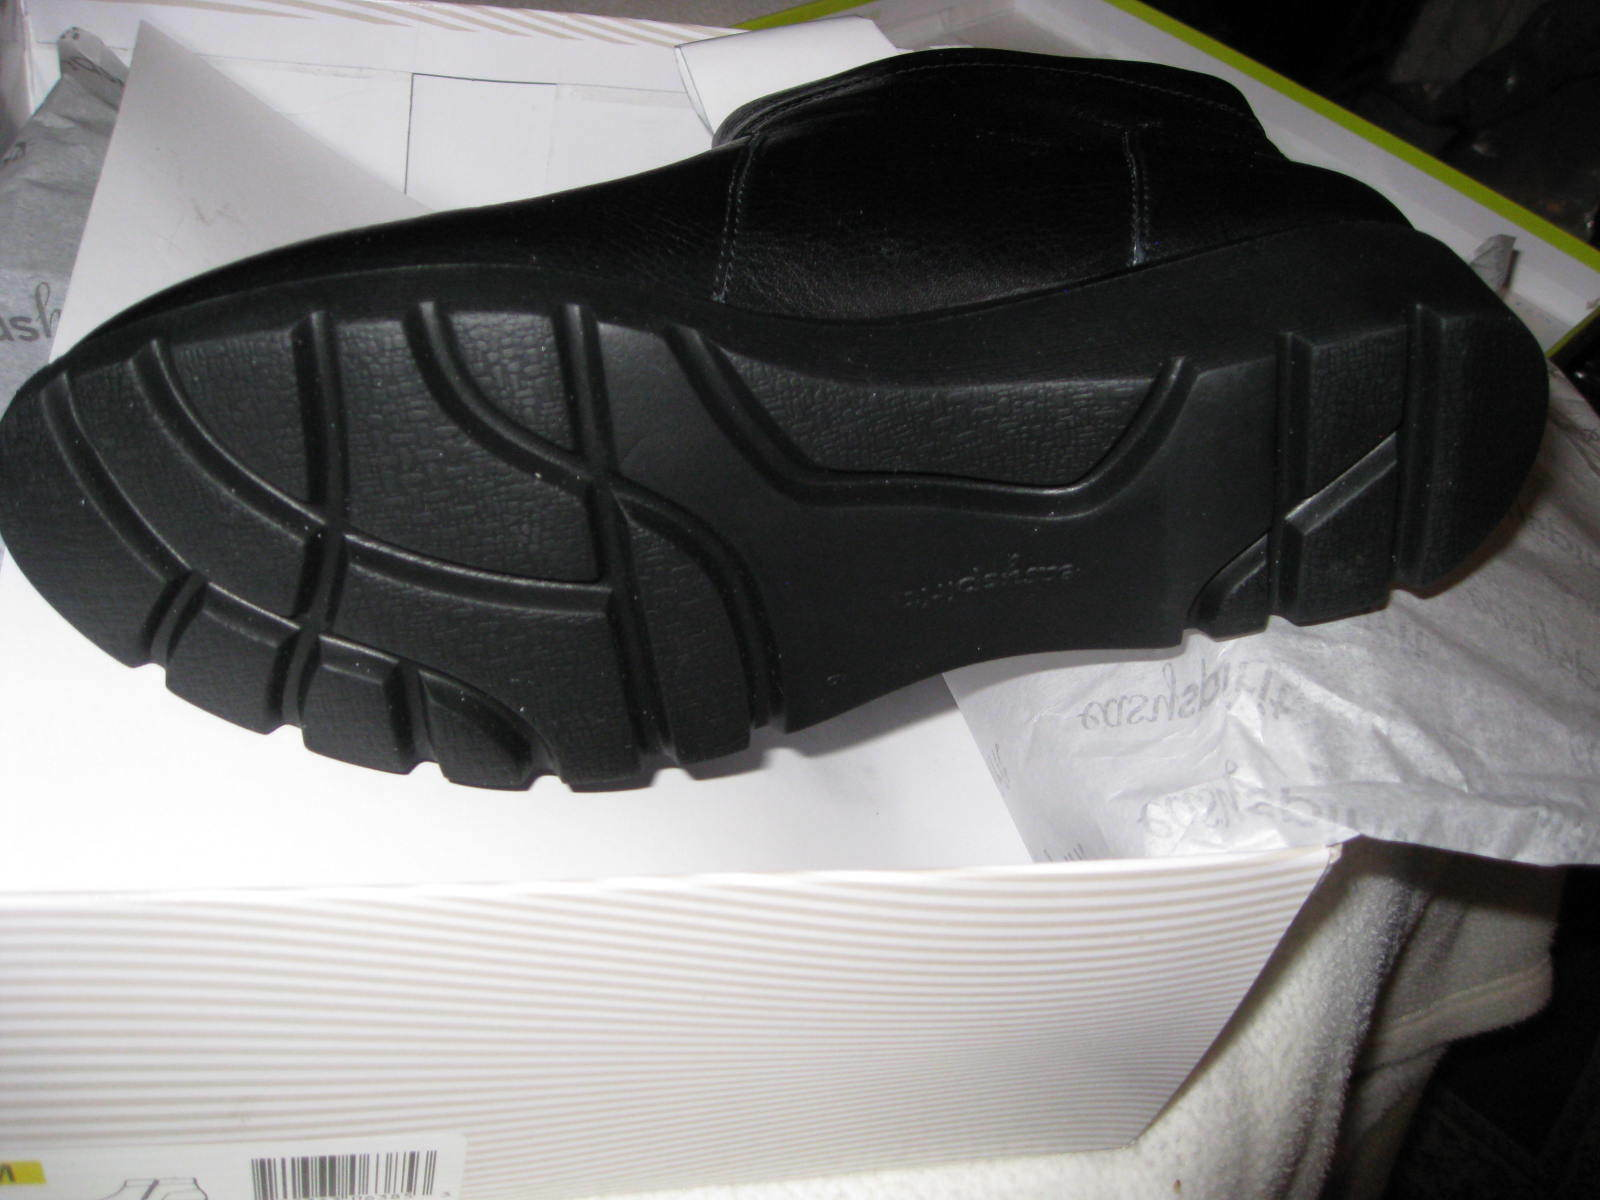 New EASY SPIRIT Ocili Black Boot Boot Boot SIZE 9 Ladies Ankle Zip E360 Easy Spirit BOOTIE 783f59